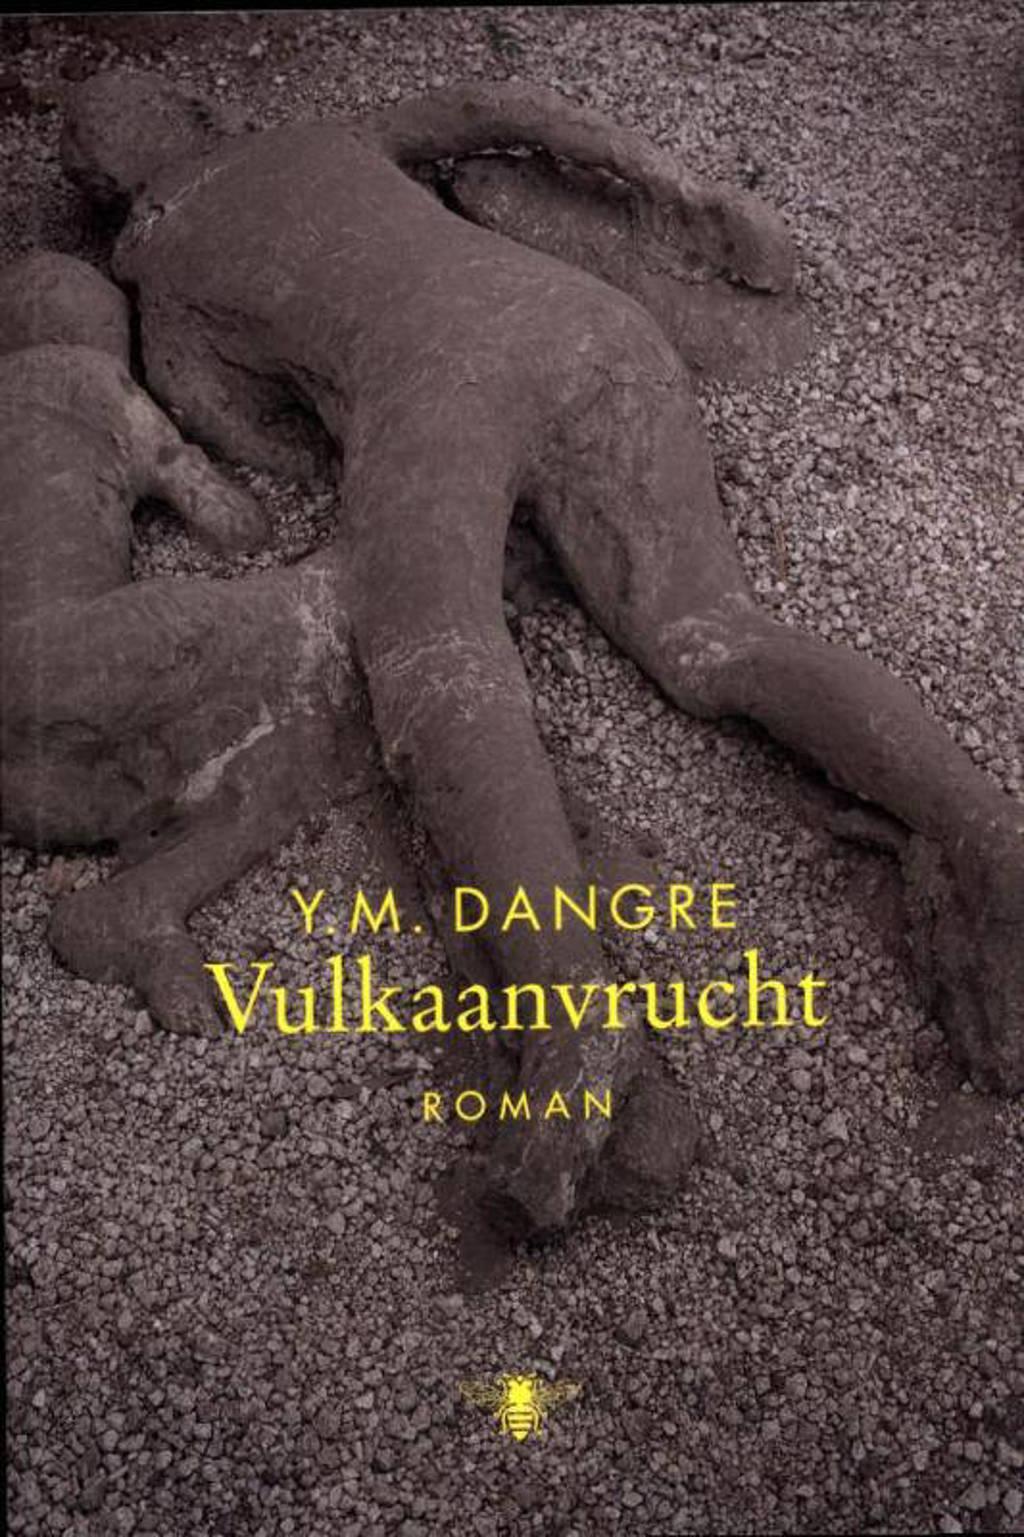 Vulkaanvrucht - Y.M. Dangre